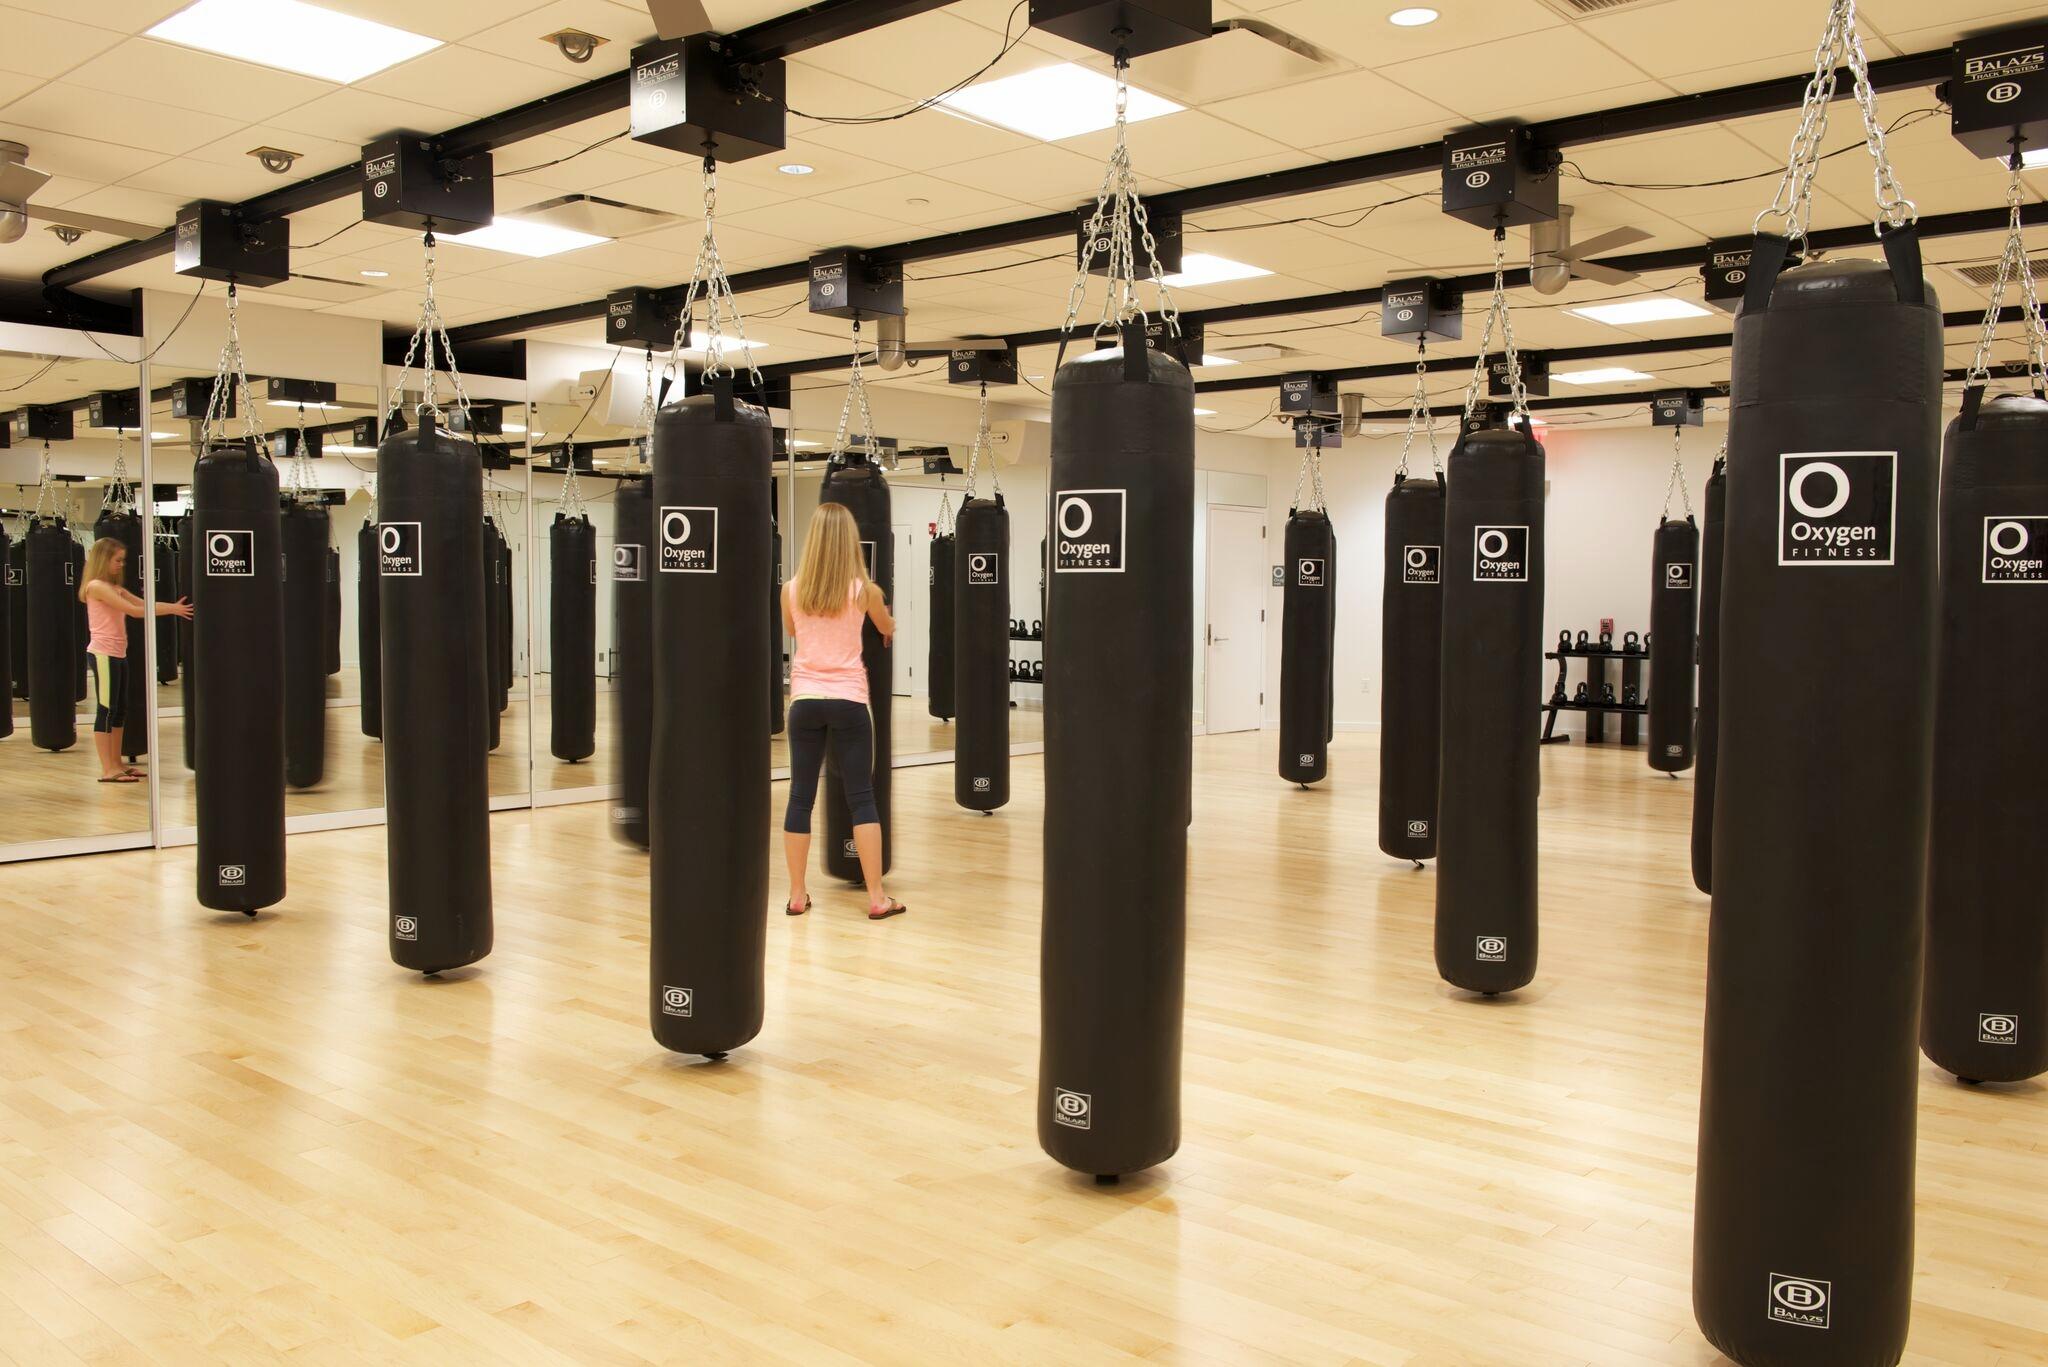 Abbie Stone - oxygen gym,photography, interior design, architect, intern, career